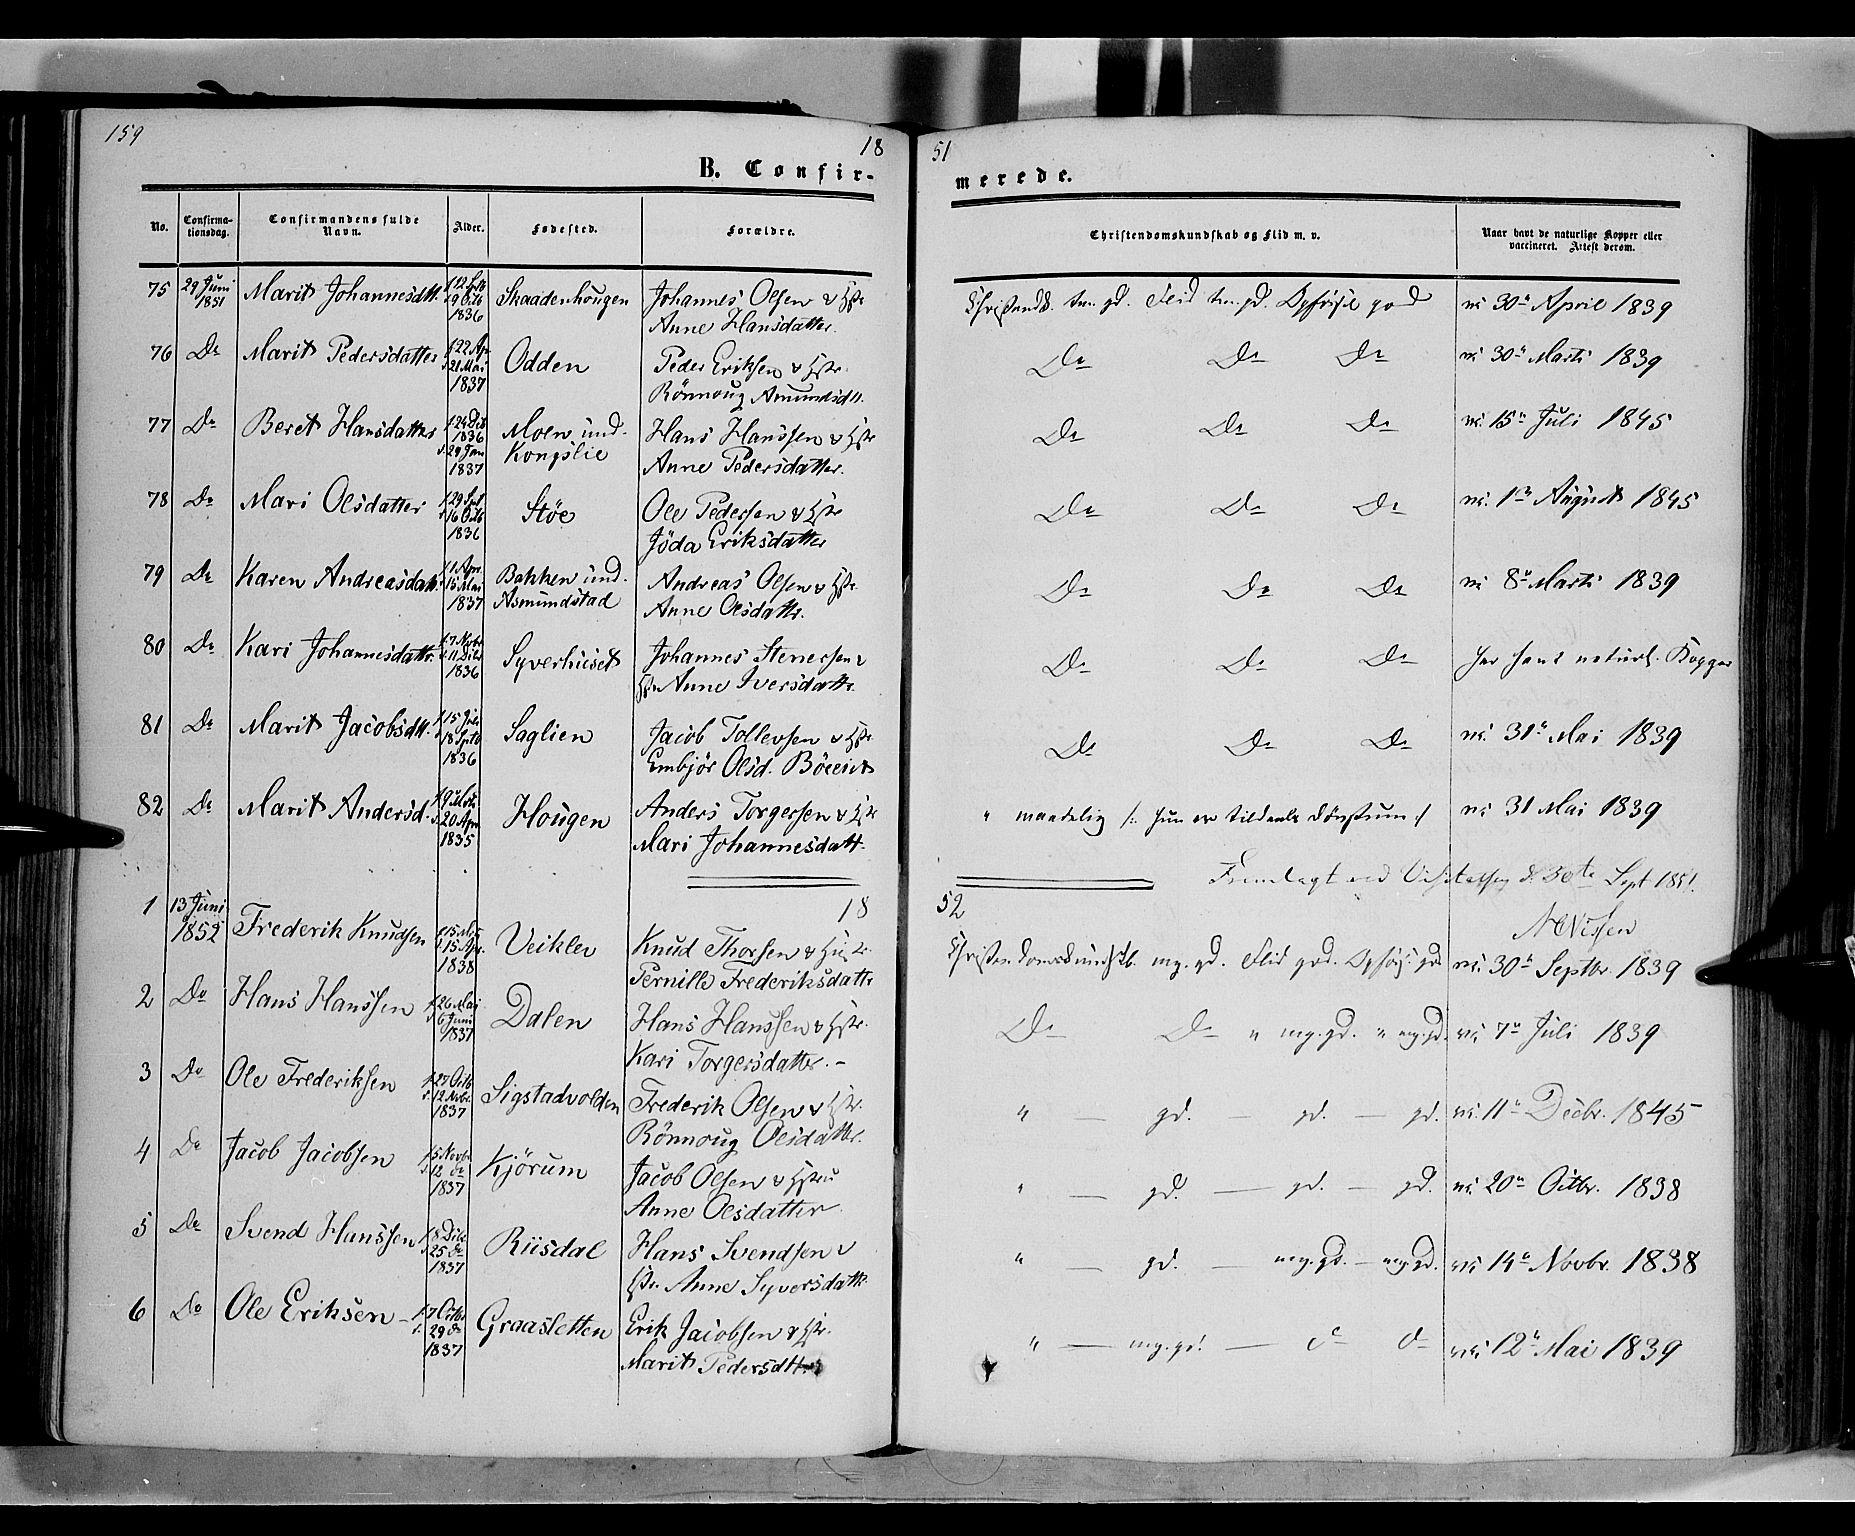 SAH, Nord-Fron prestekontor, Ministerialbok nr. 1, 1851-1864, s. 159